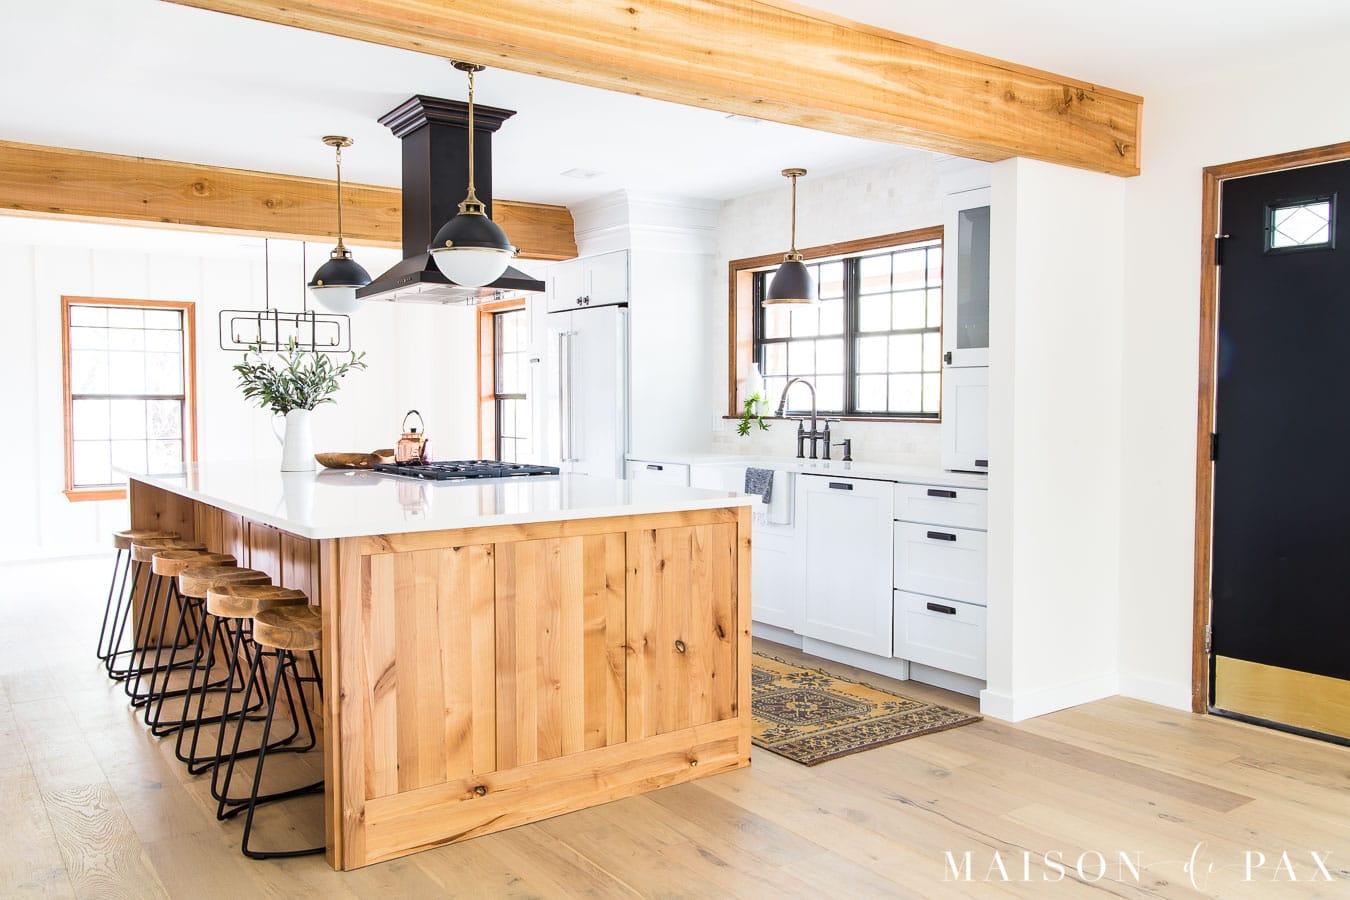 Rustic Modern Farmhouse Kitchen Reveal - Maison de Pax on Farmhouse Rustic Kitchen  id=58415